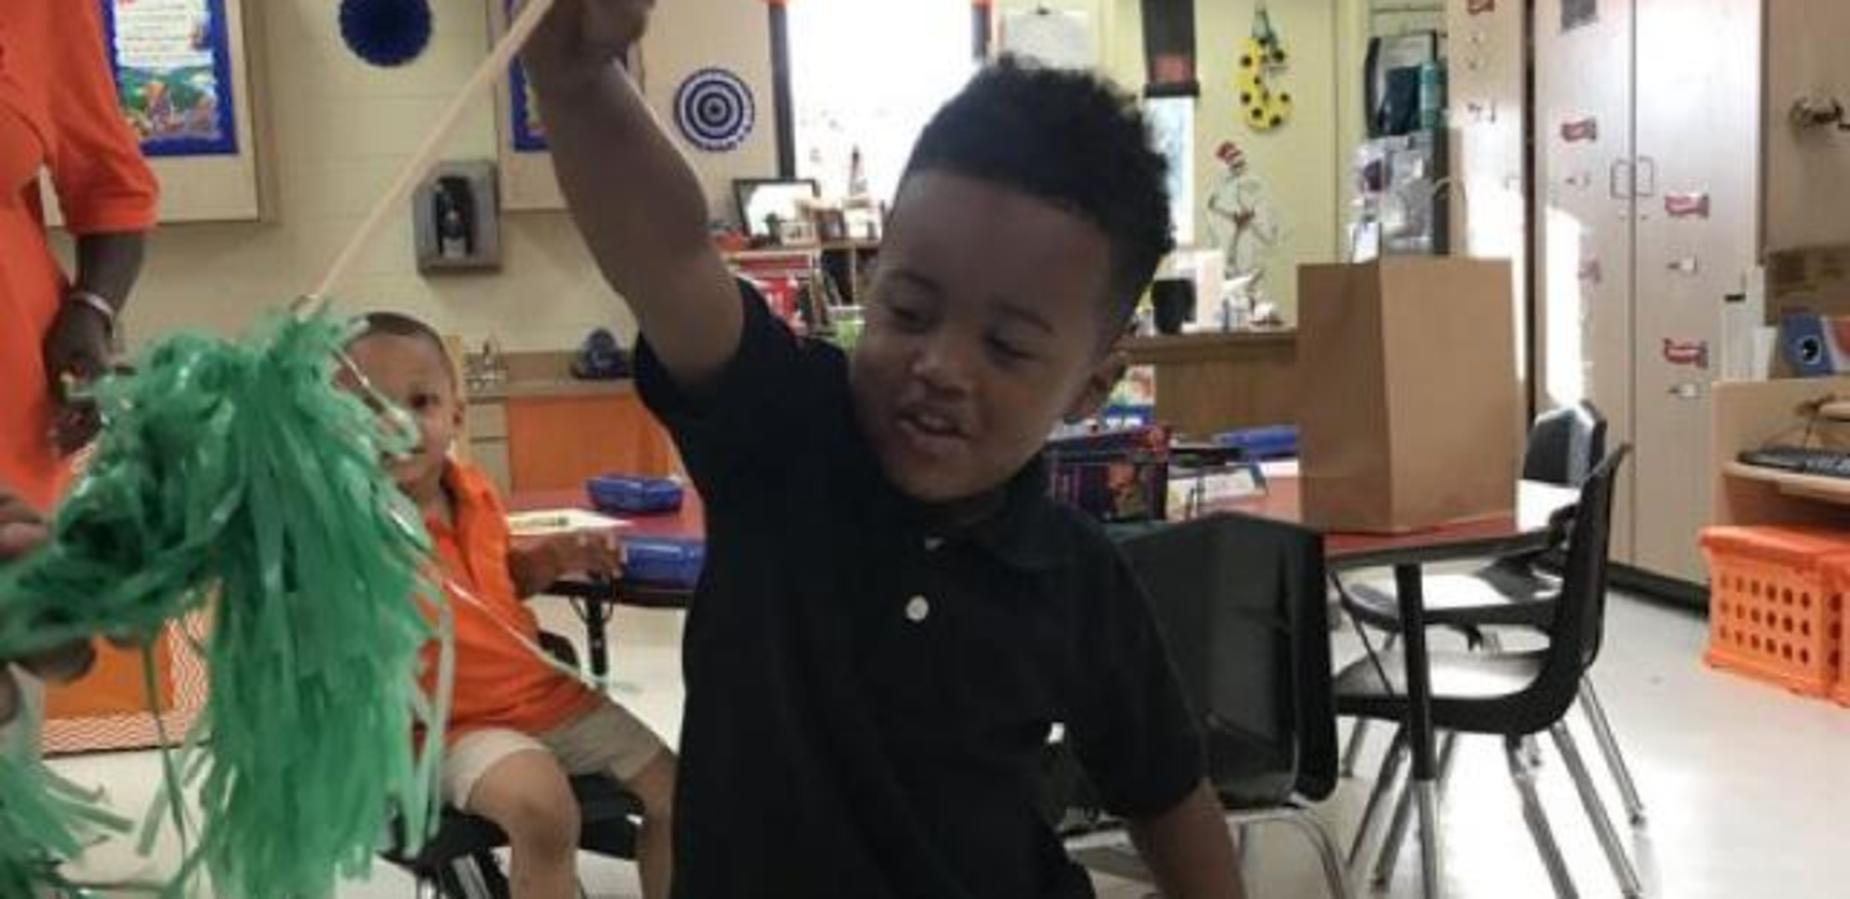 Student waving a green pompom.